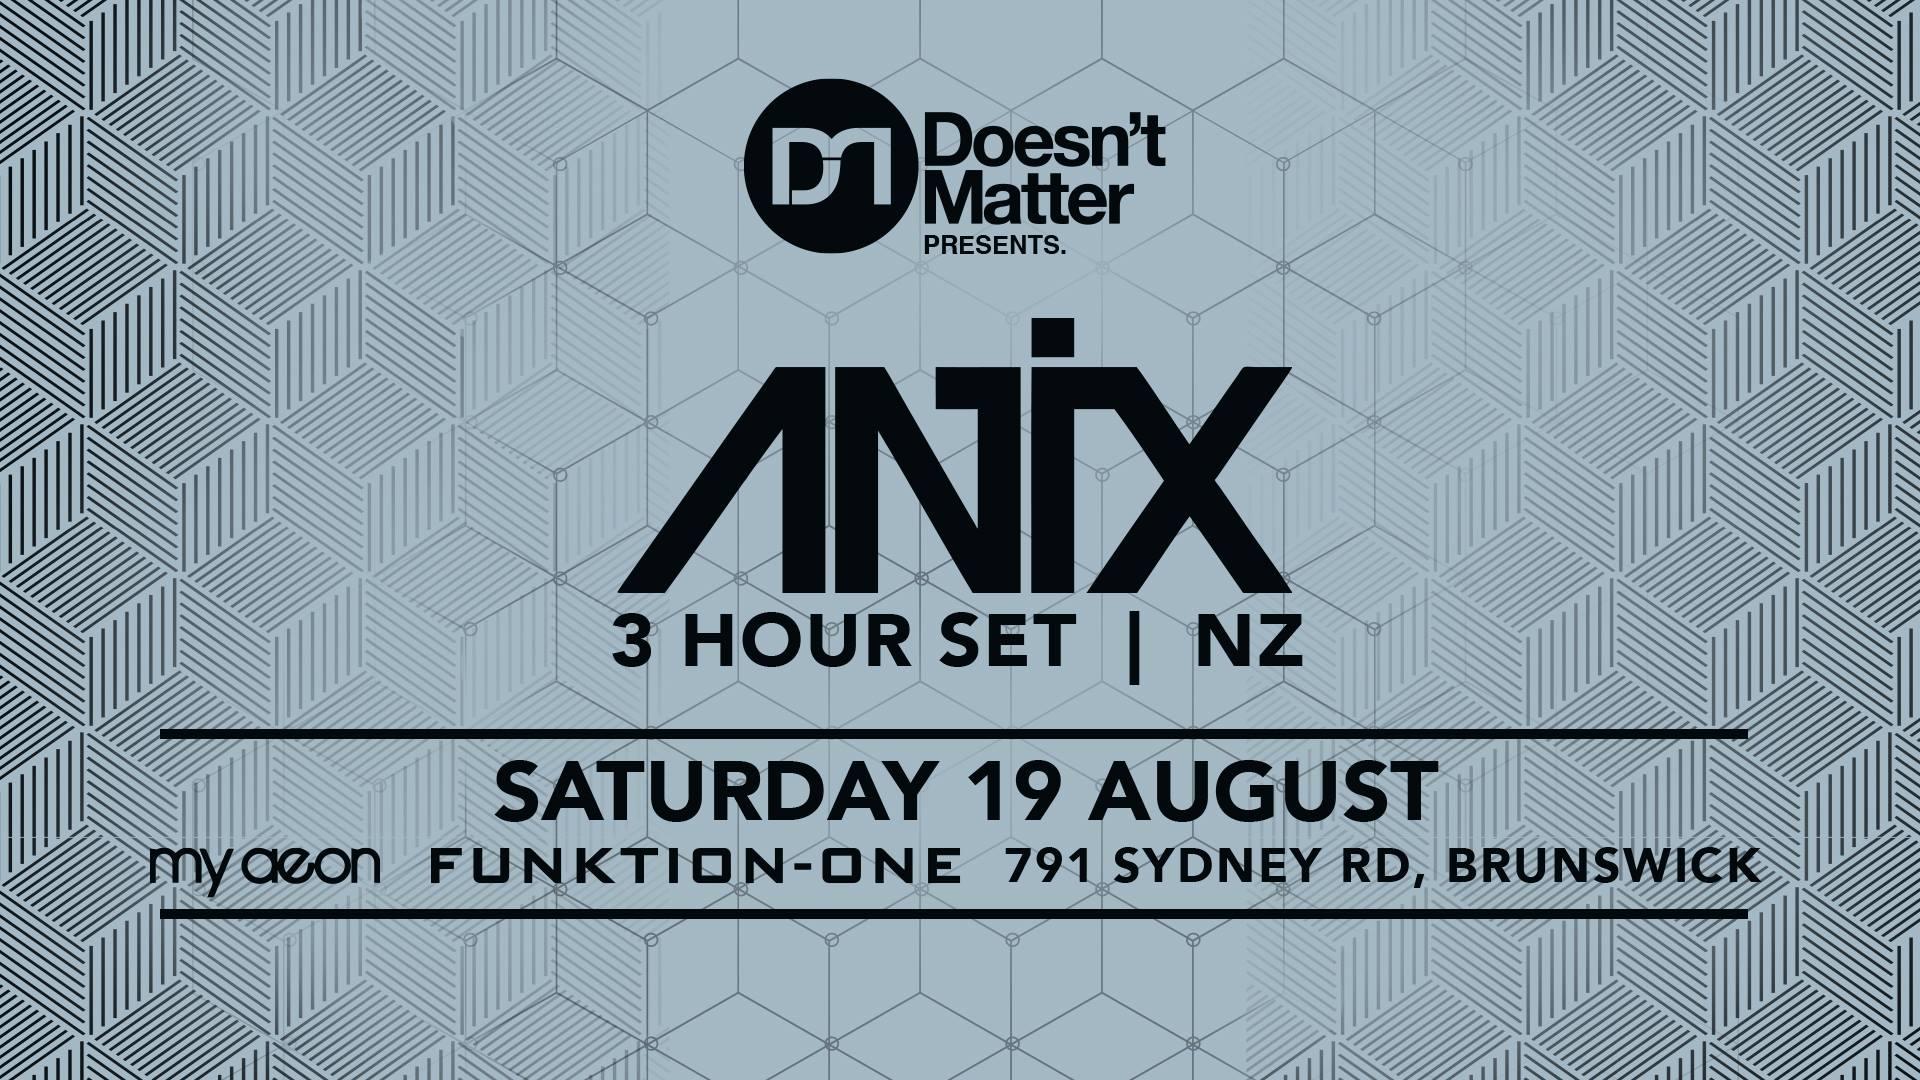 Doesnt't Matter Present Antix (3 hour set) : 18th August 2017